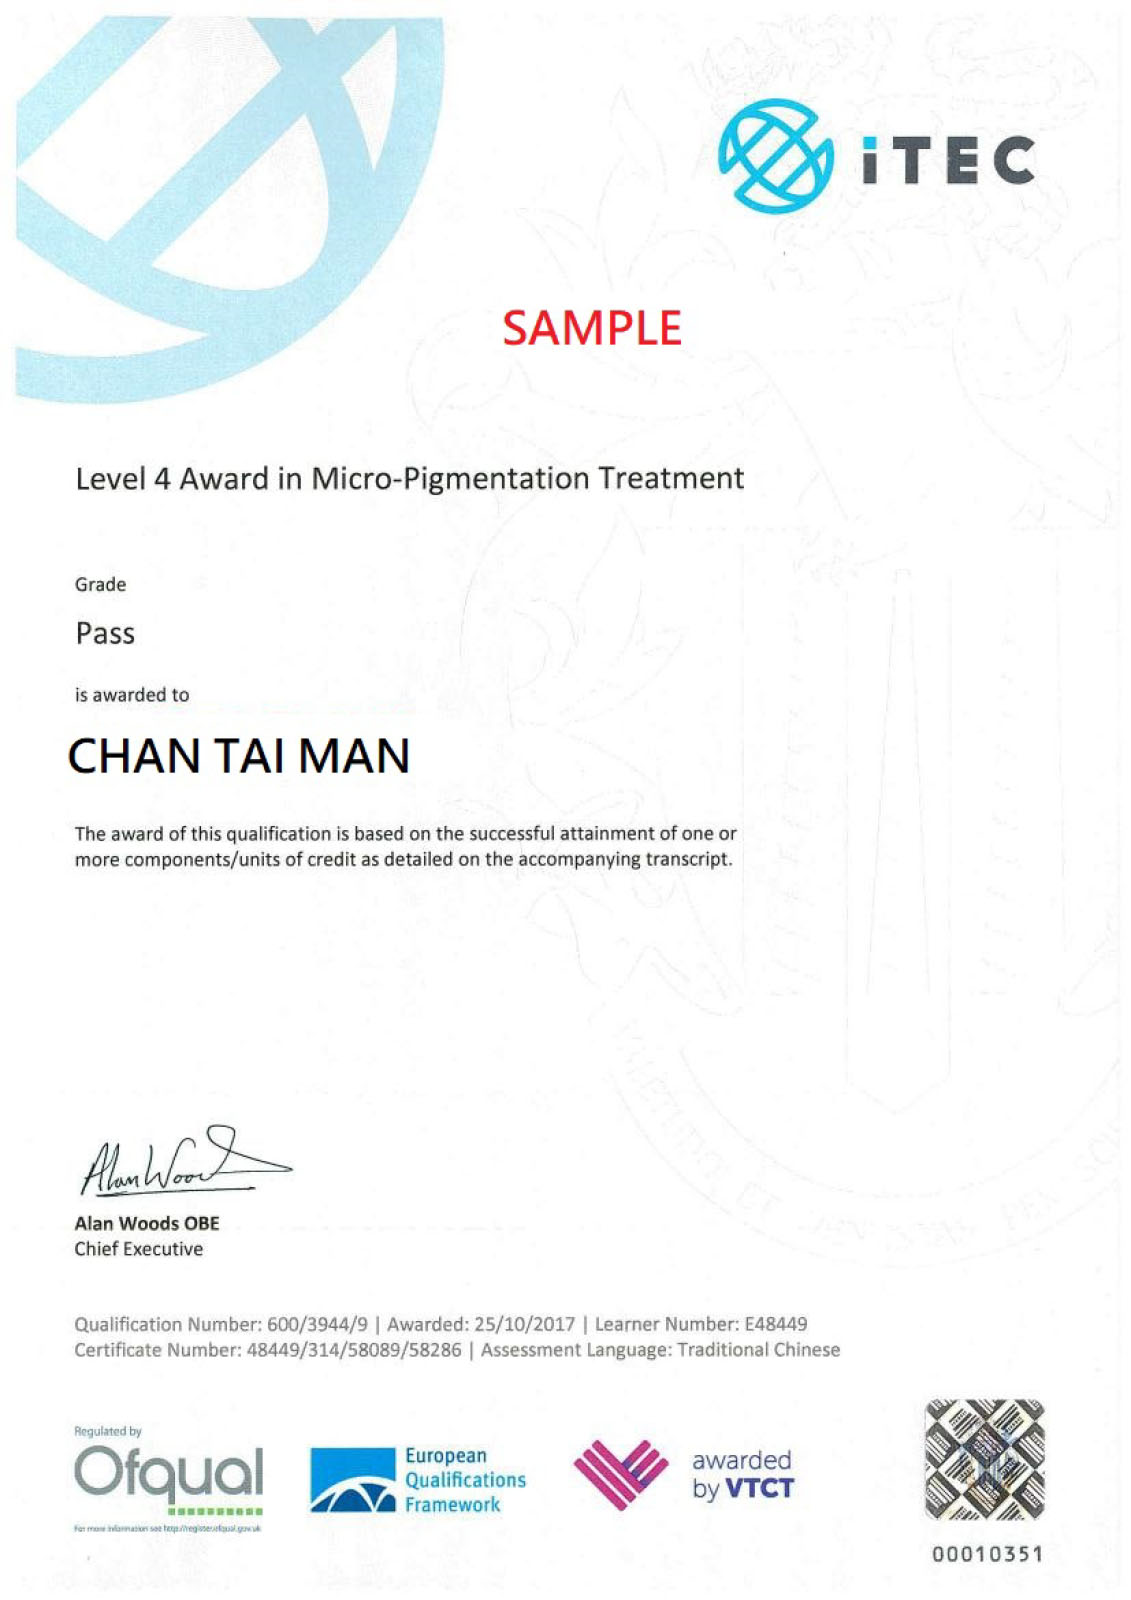 ITEC_micropigmentation_treatment